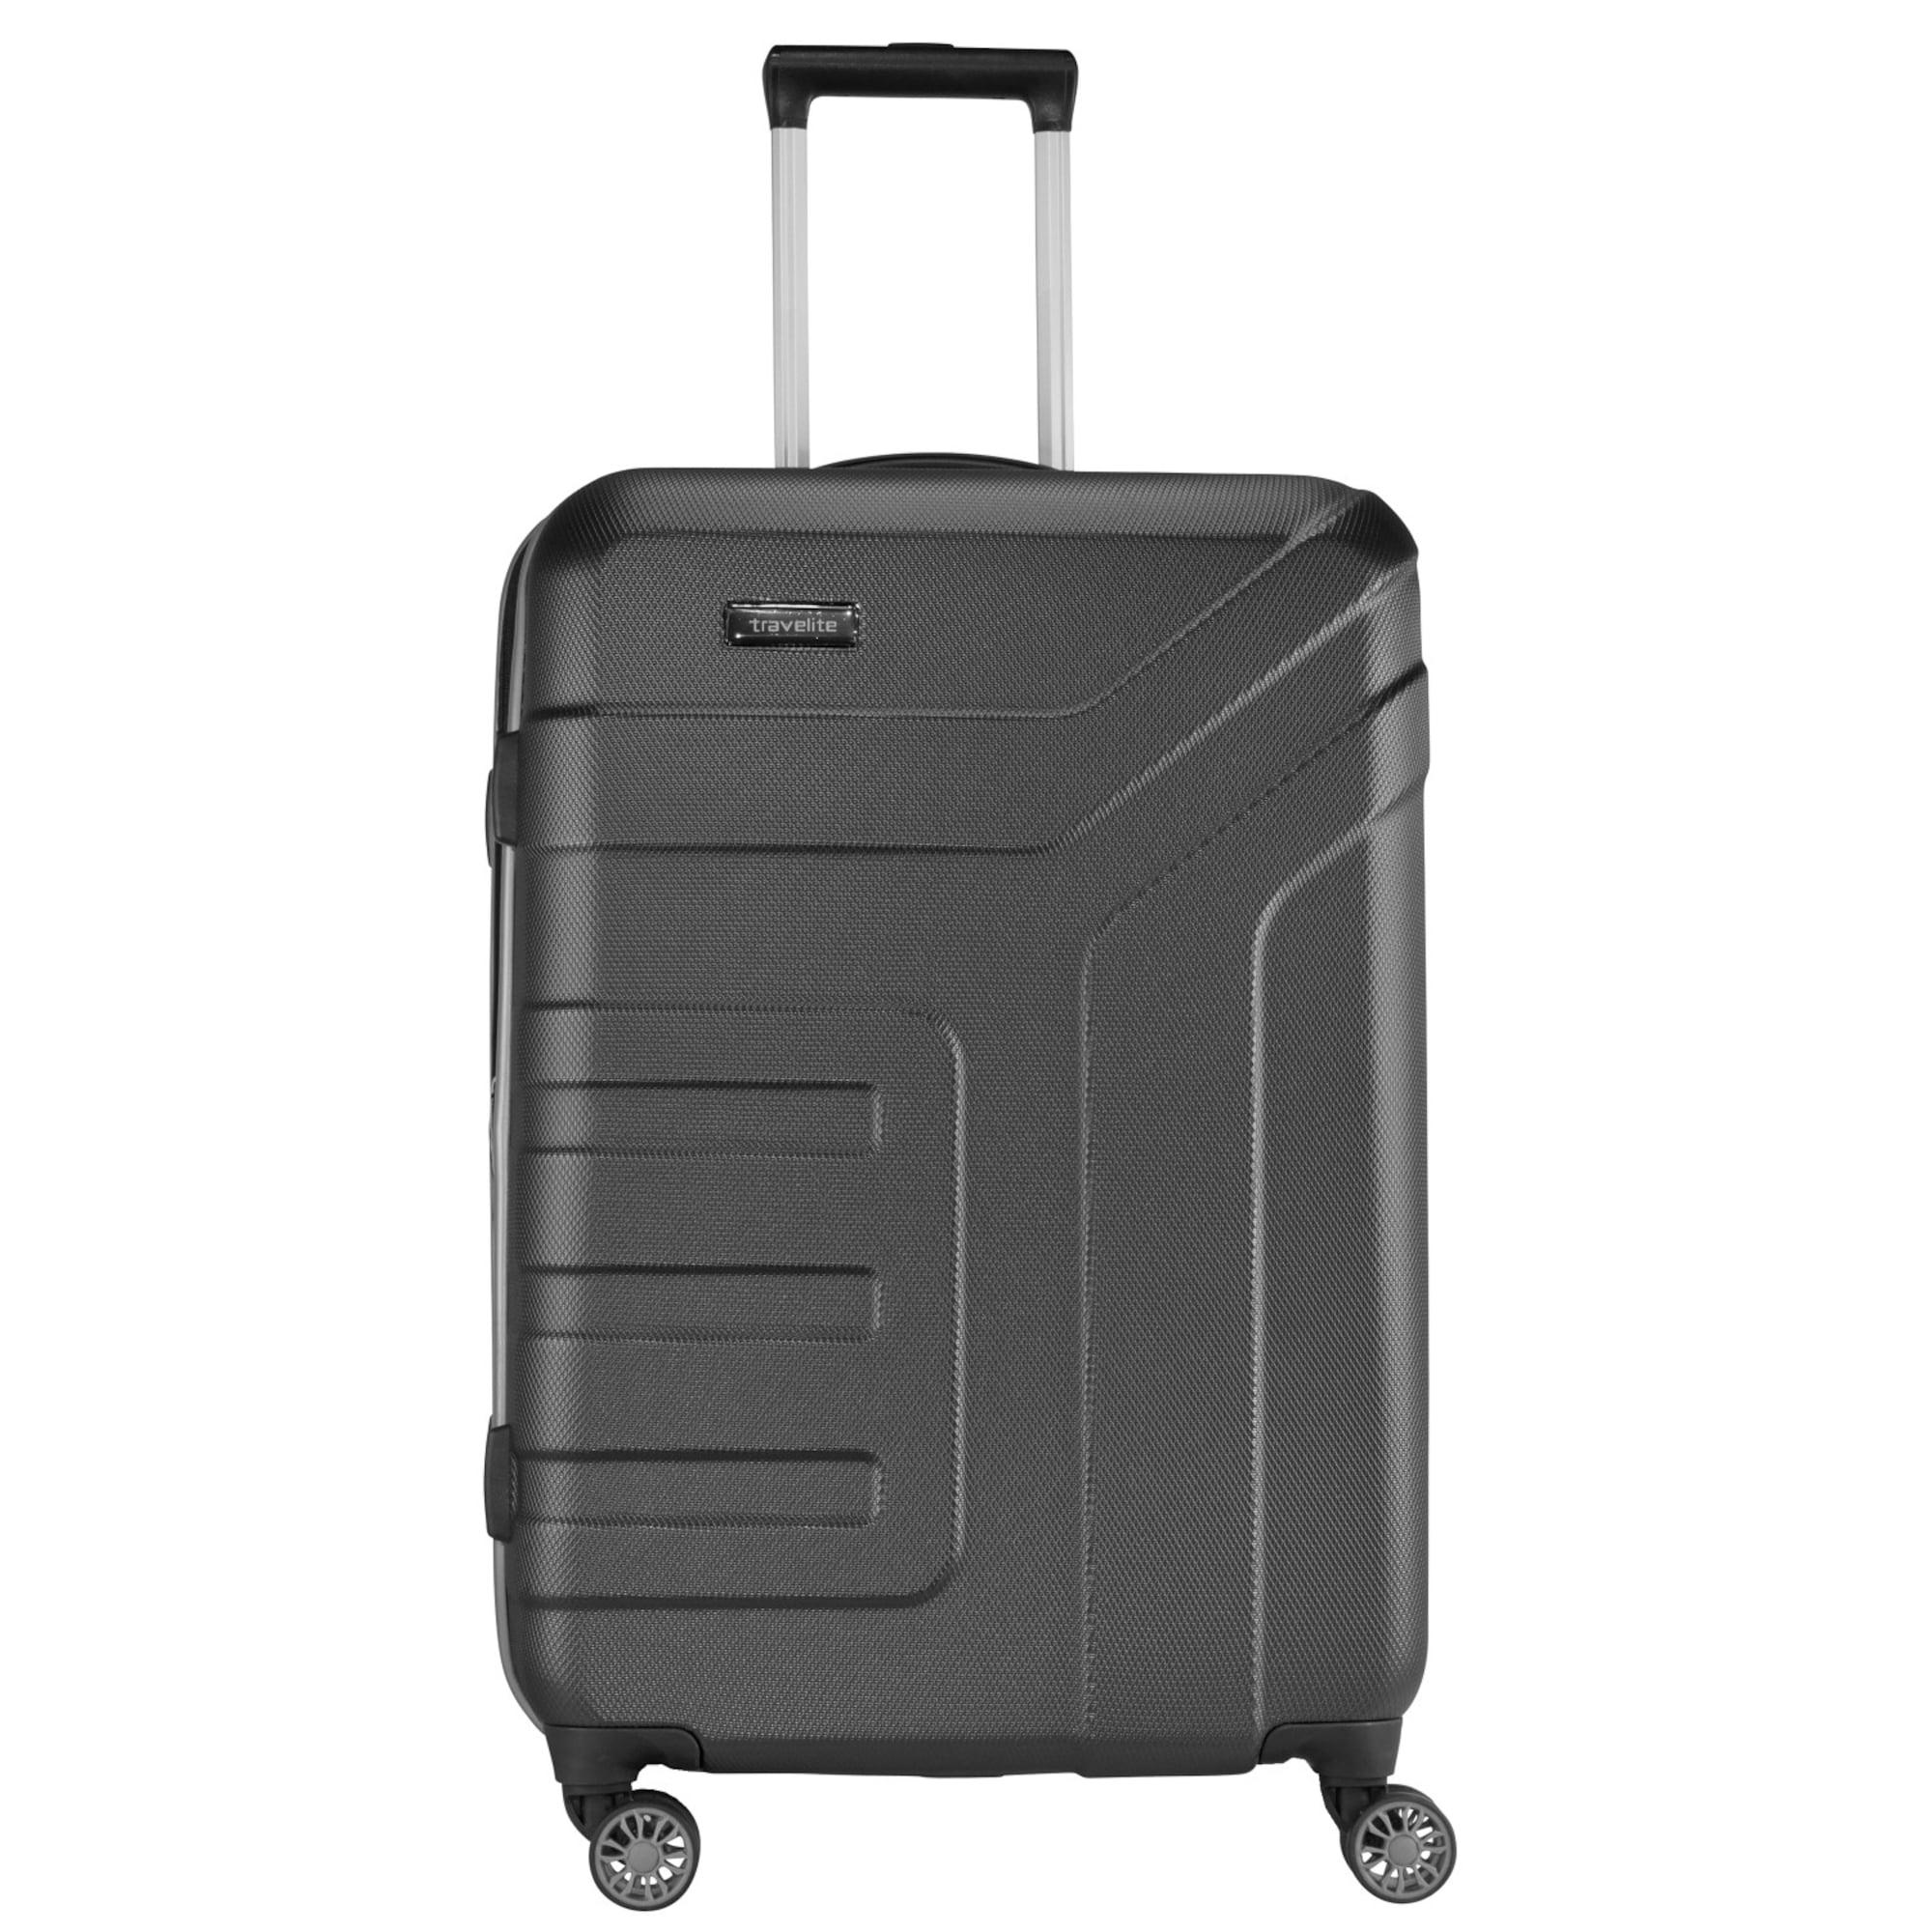 Trolley | Taschen > Koffer & Trolleys > Trolleys | Travelite